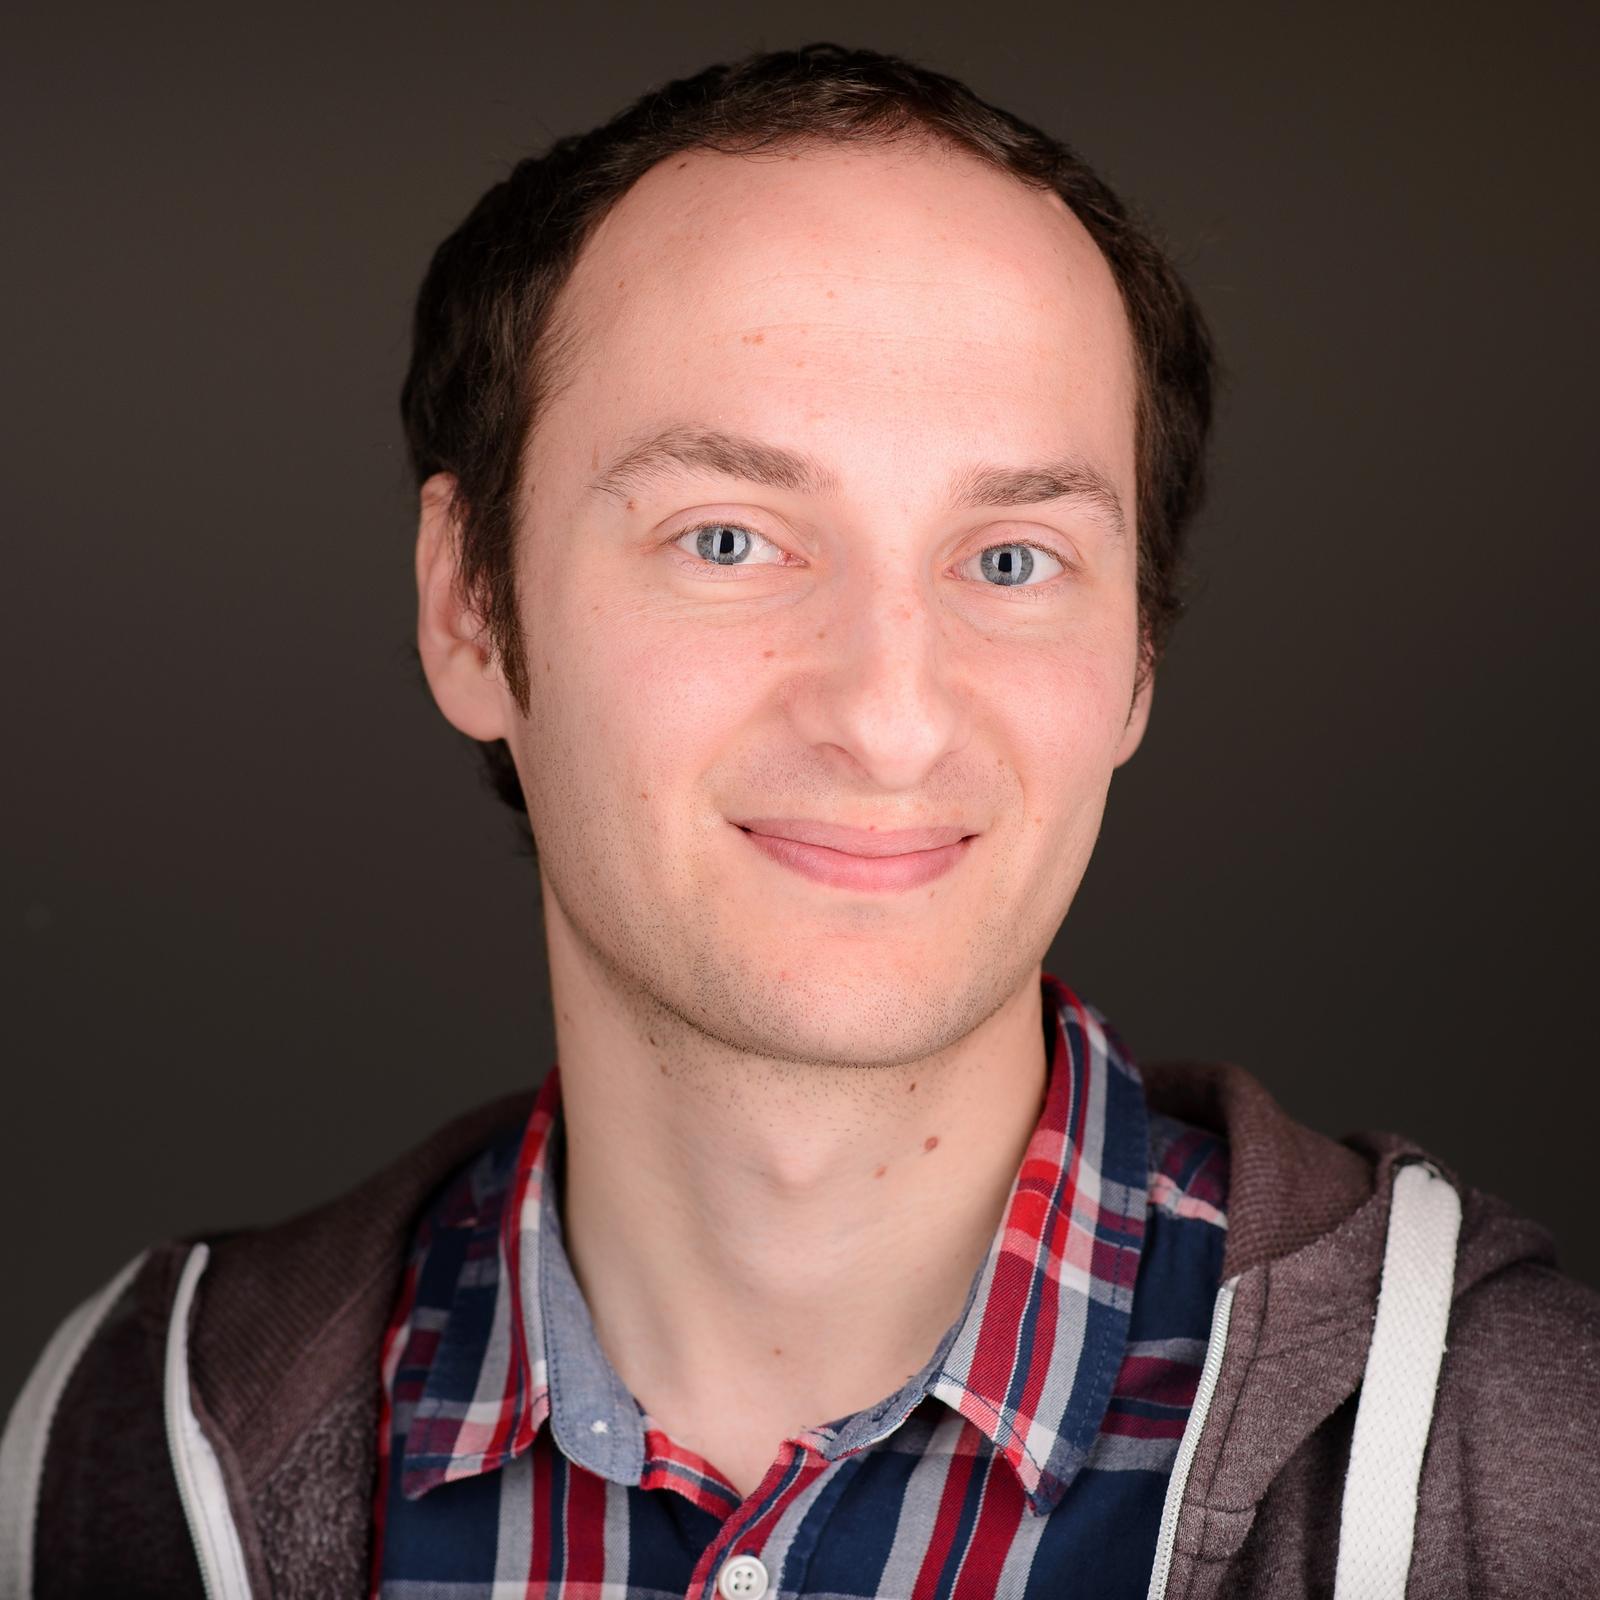 Robbie van Aert - Post-DocMeta-analysis, publication bias methods, assessing replicability of research. Developer of the publication bias method p-uniform.Email - Website